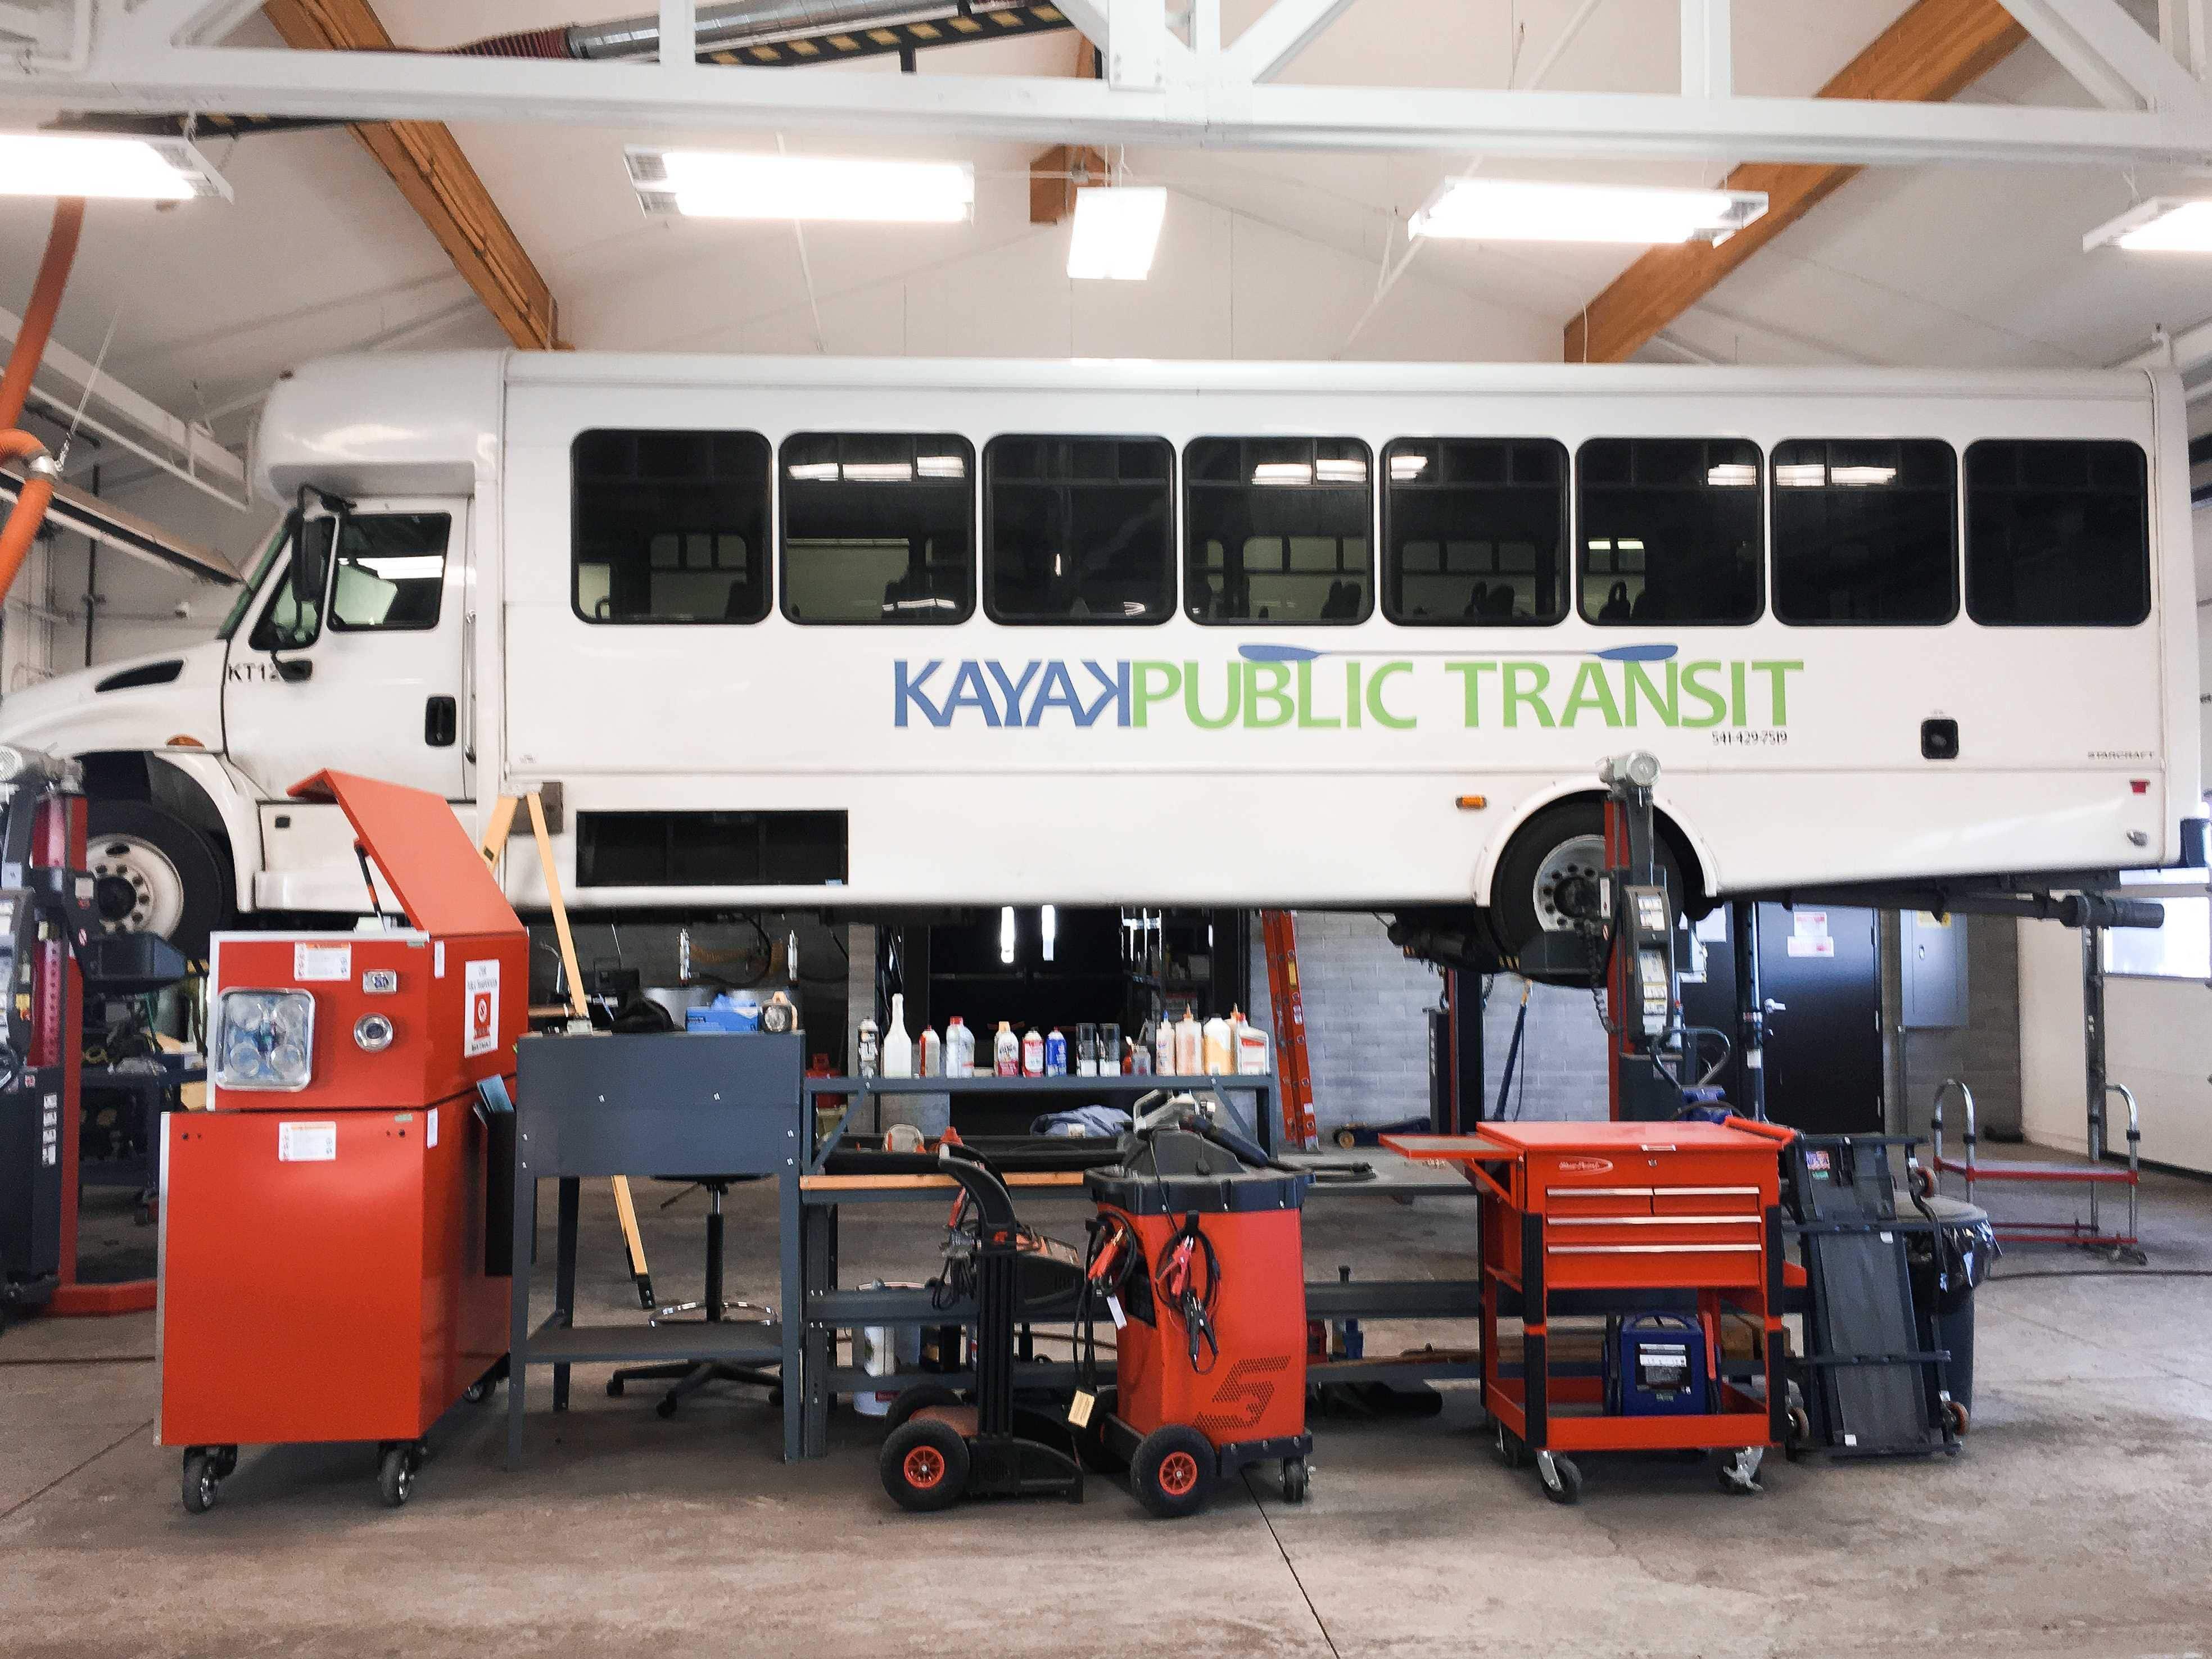 Kayak Public Transit Bus undergoing maintenance